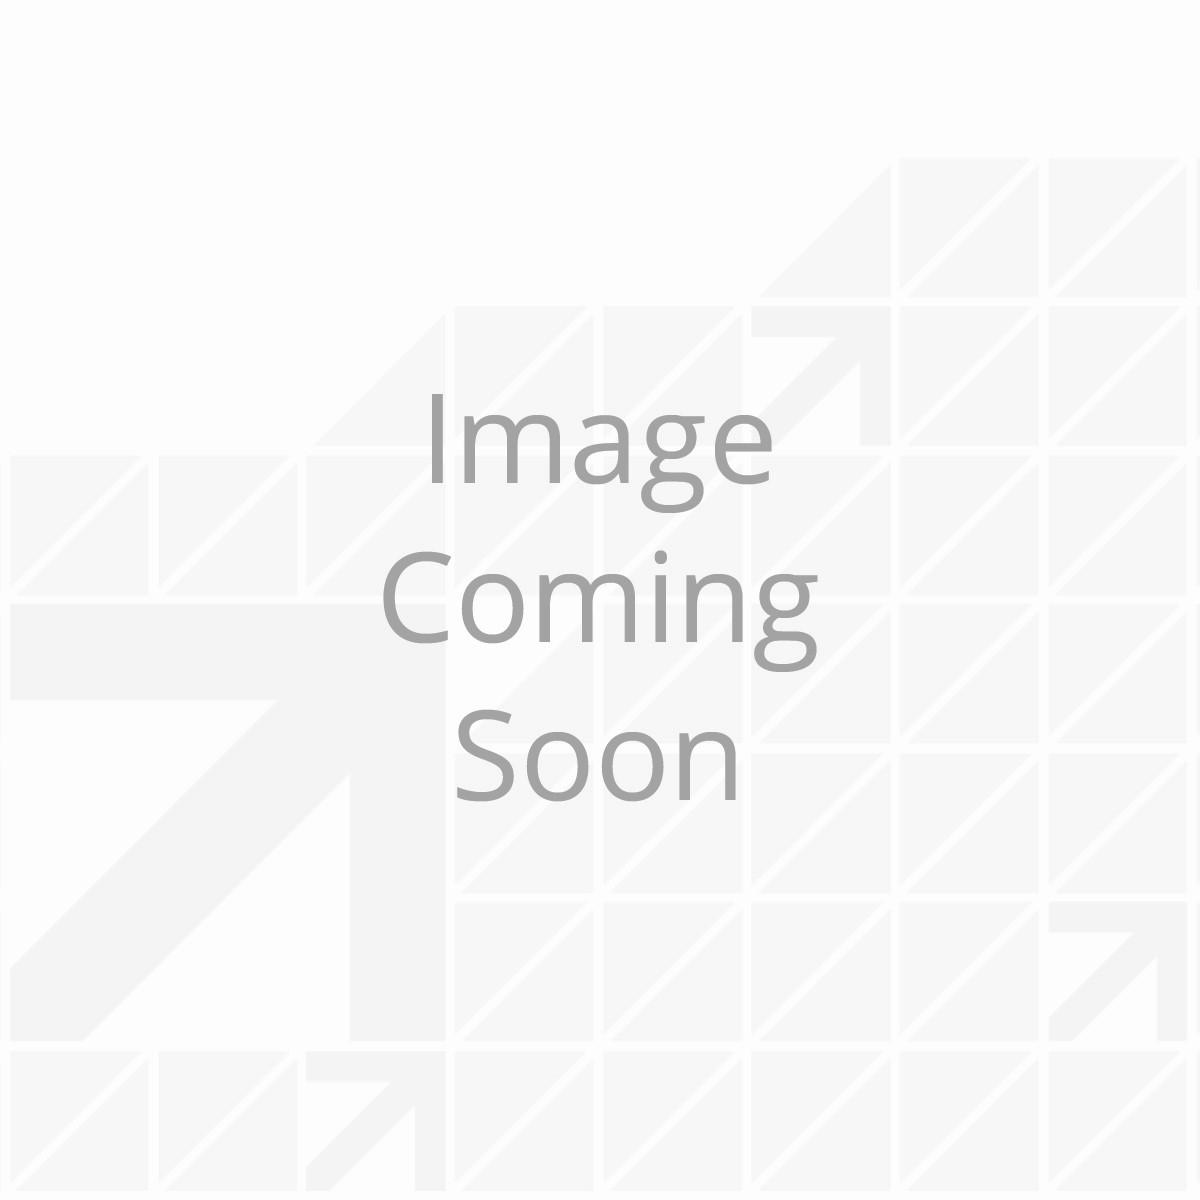 10 cu ft Refrigerator, Stainless Steel